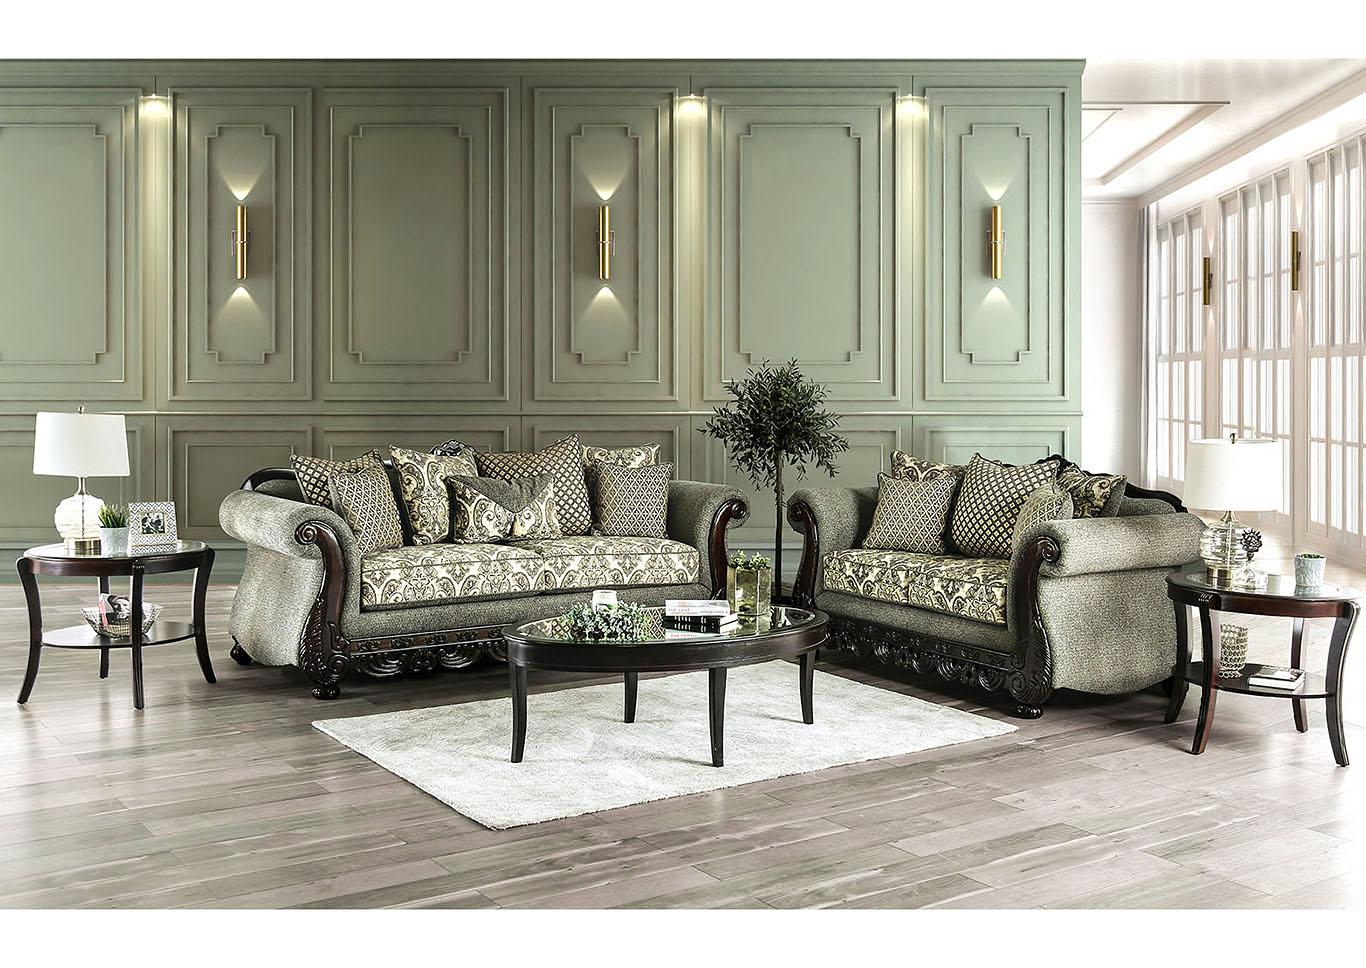 Ideal Furniture San Antonio West Justina Gray Sofa & Loveseat